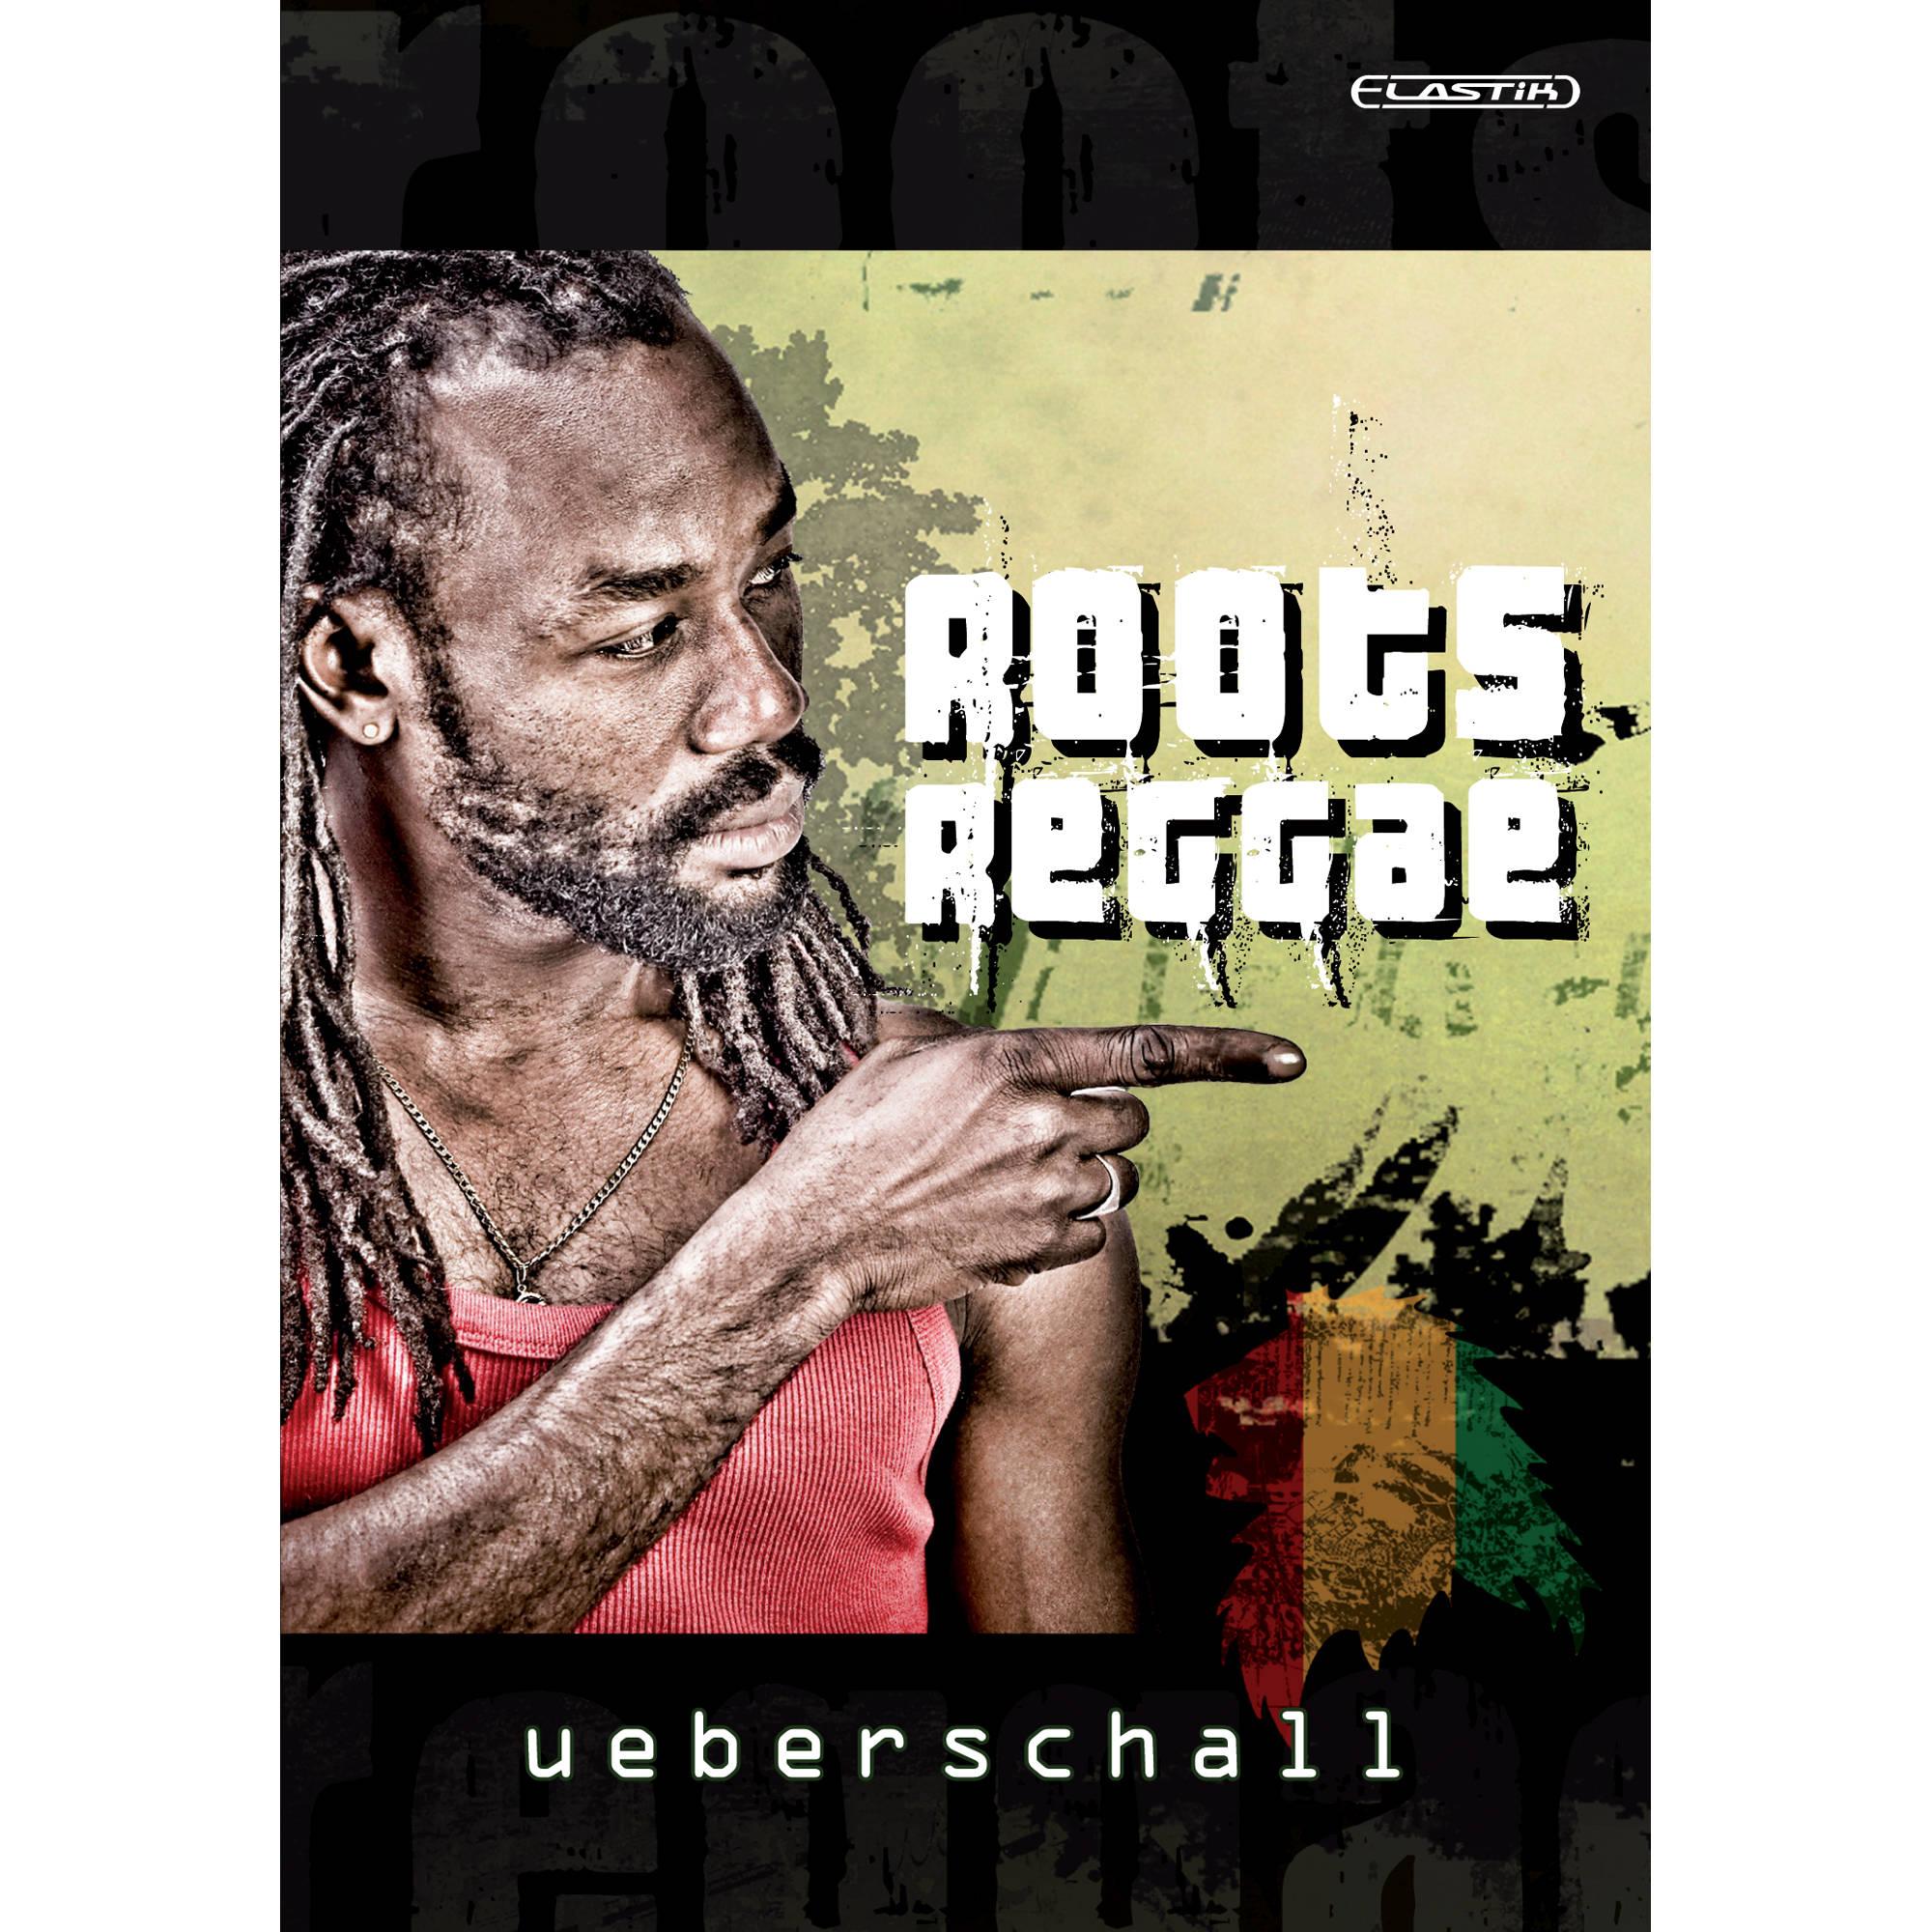 Big fish audio dvd roots reggae roots1 pw b h photo video for Big fish audio